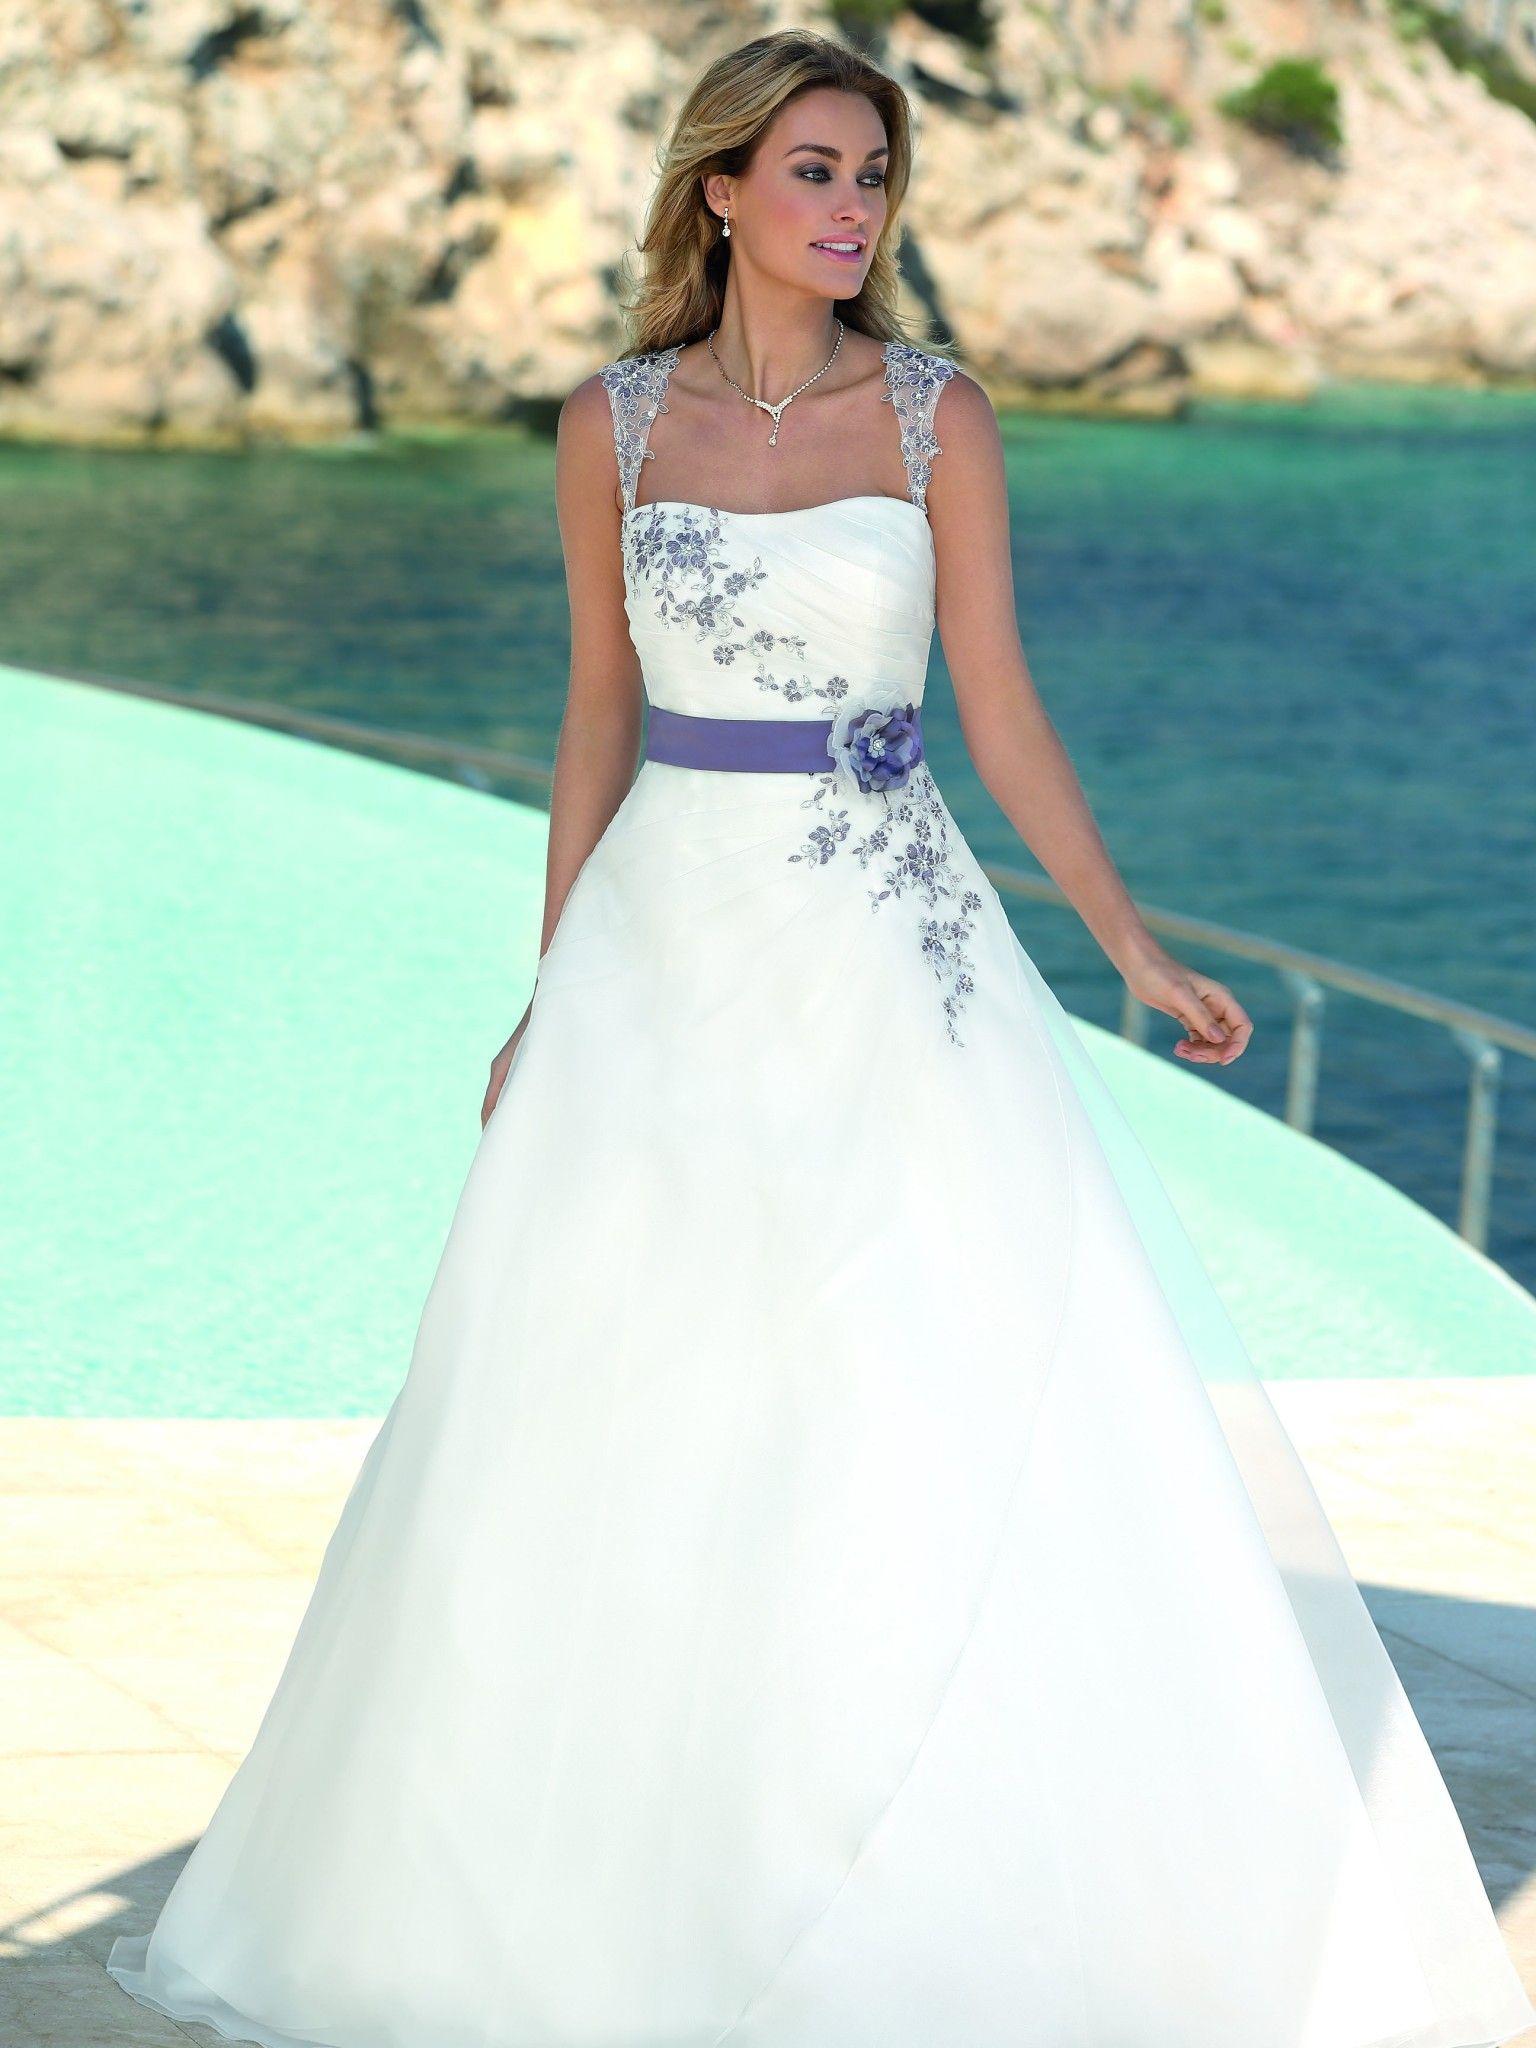 Ladybird 317032 | trouwkleed | Pinterest | Brautkleider ...